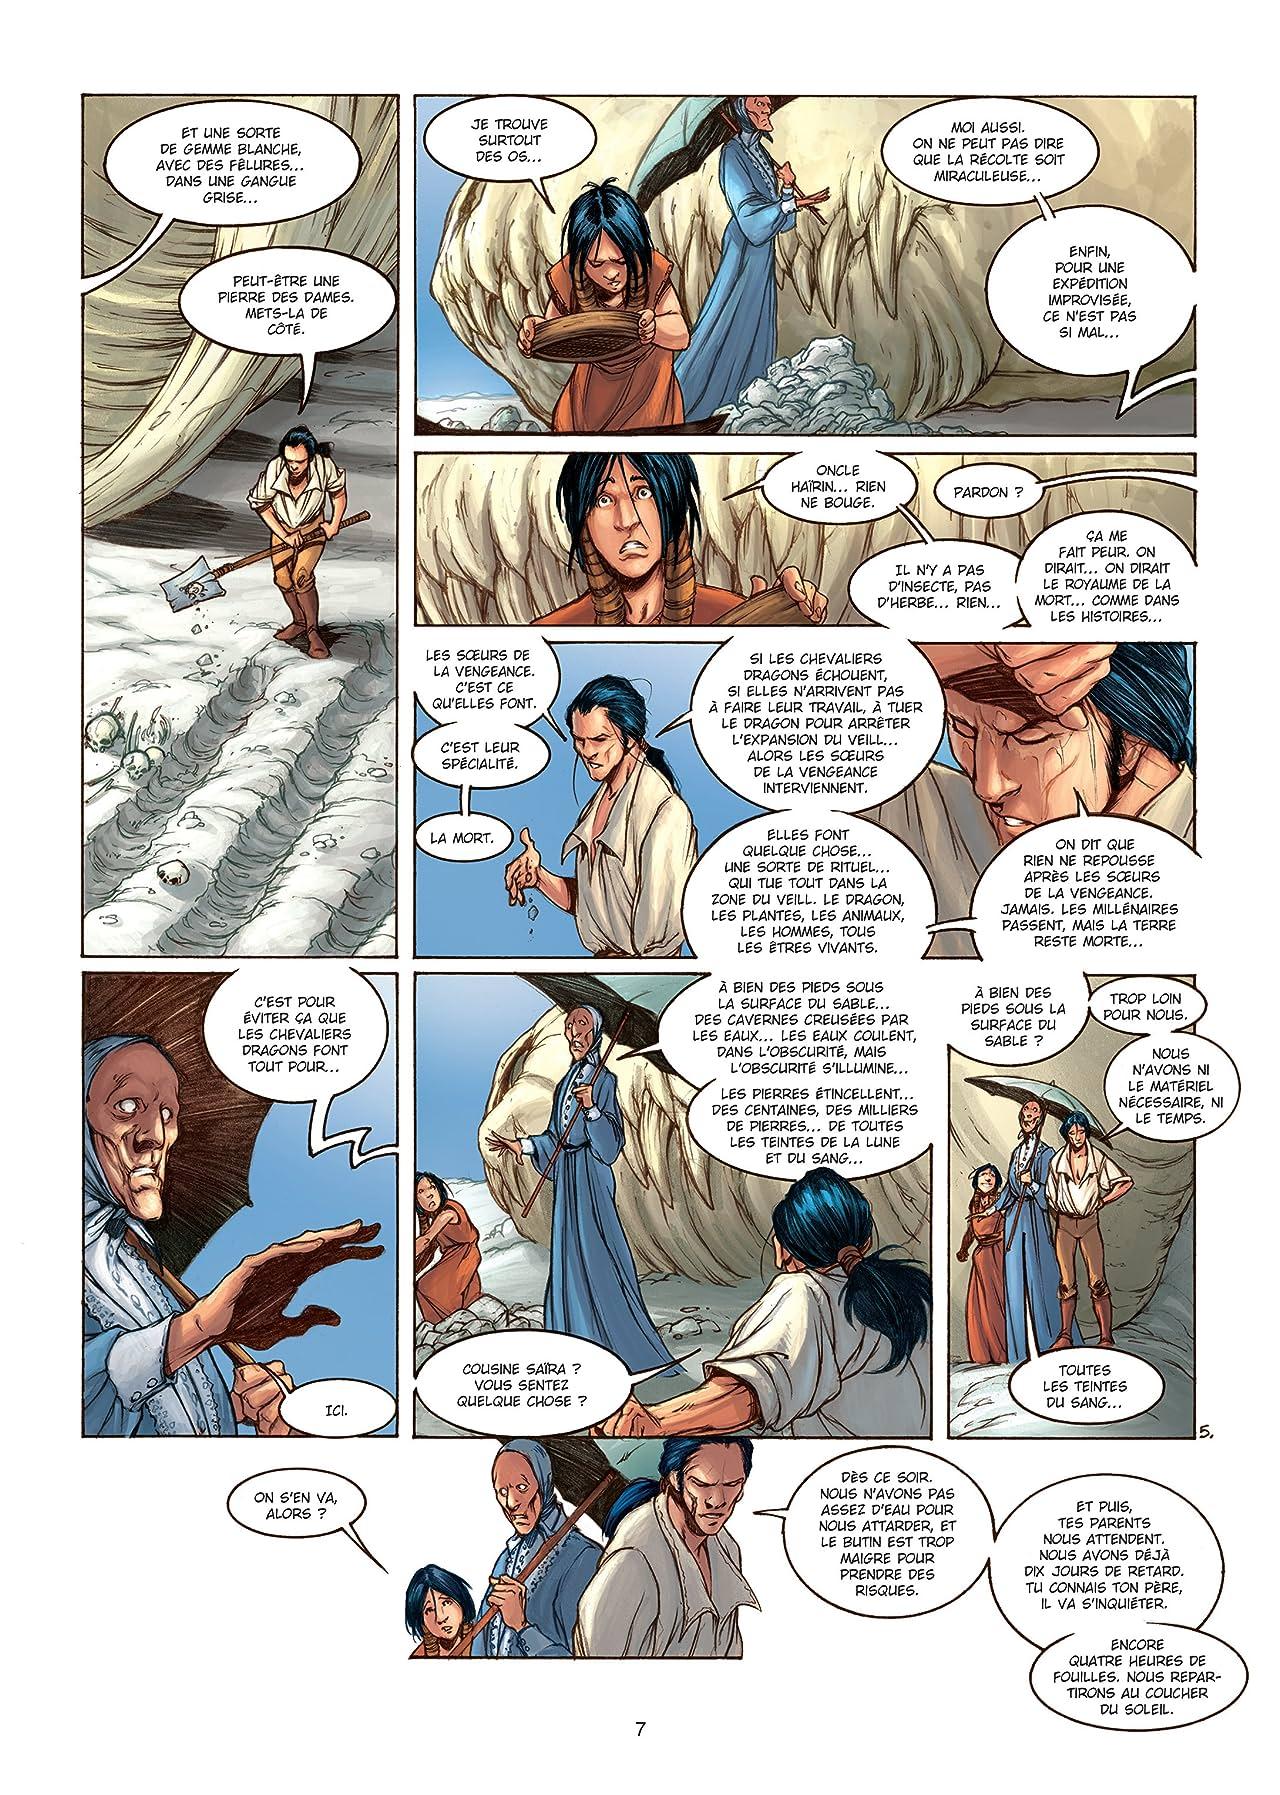 La Geste des Chevaliers Dragons Vol. 3: Le pays de non-vie